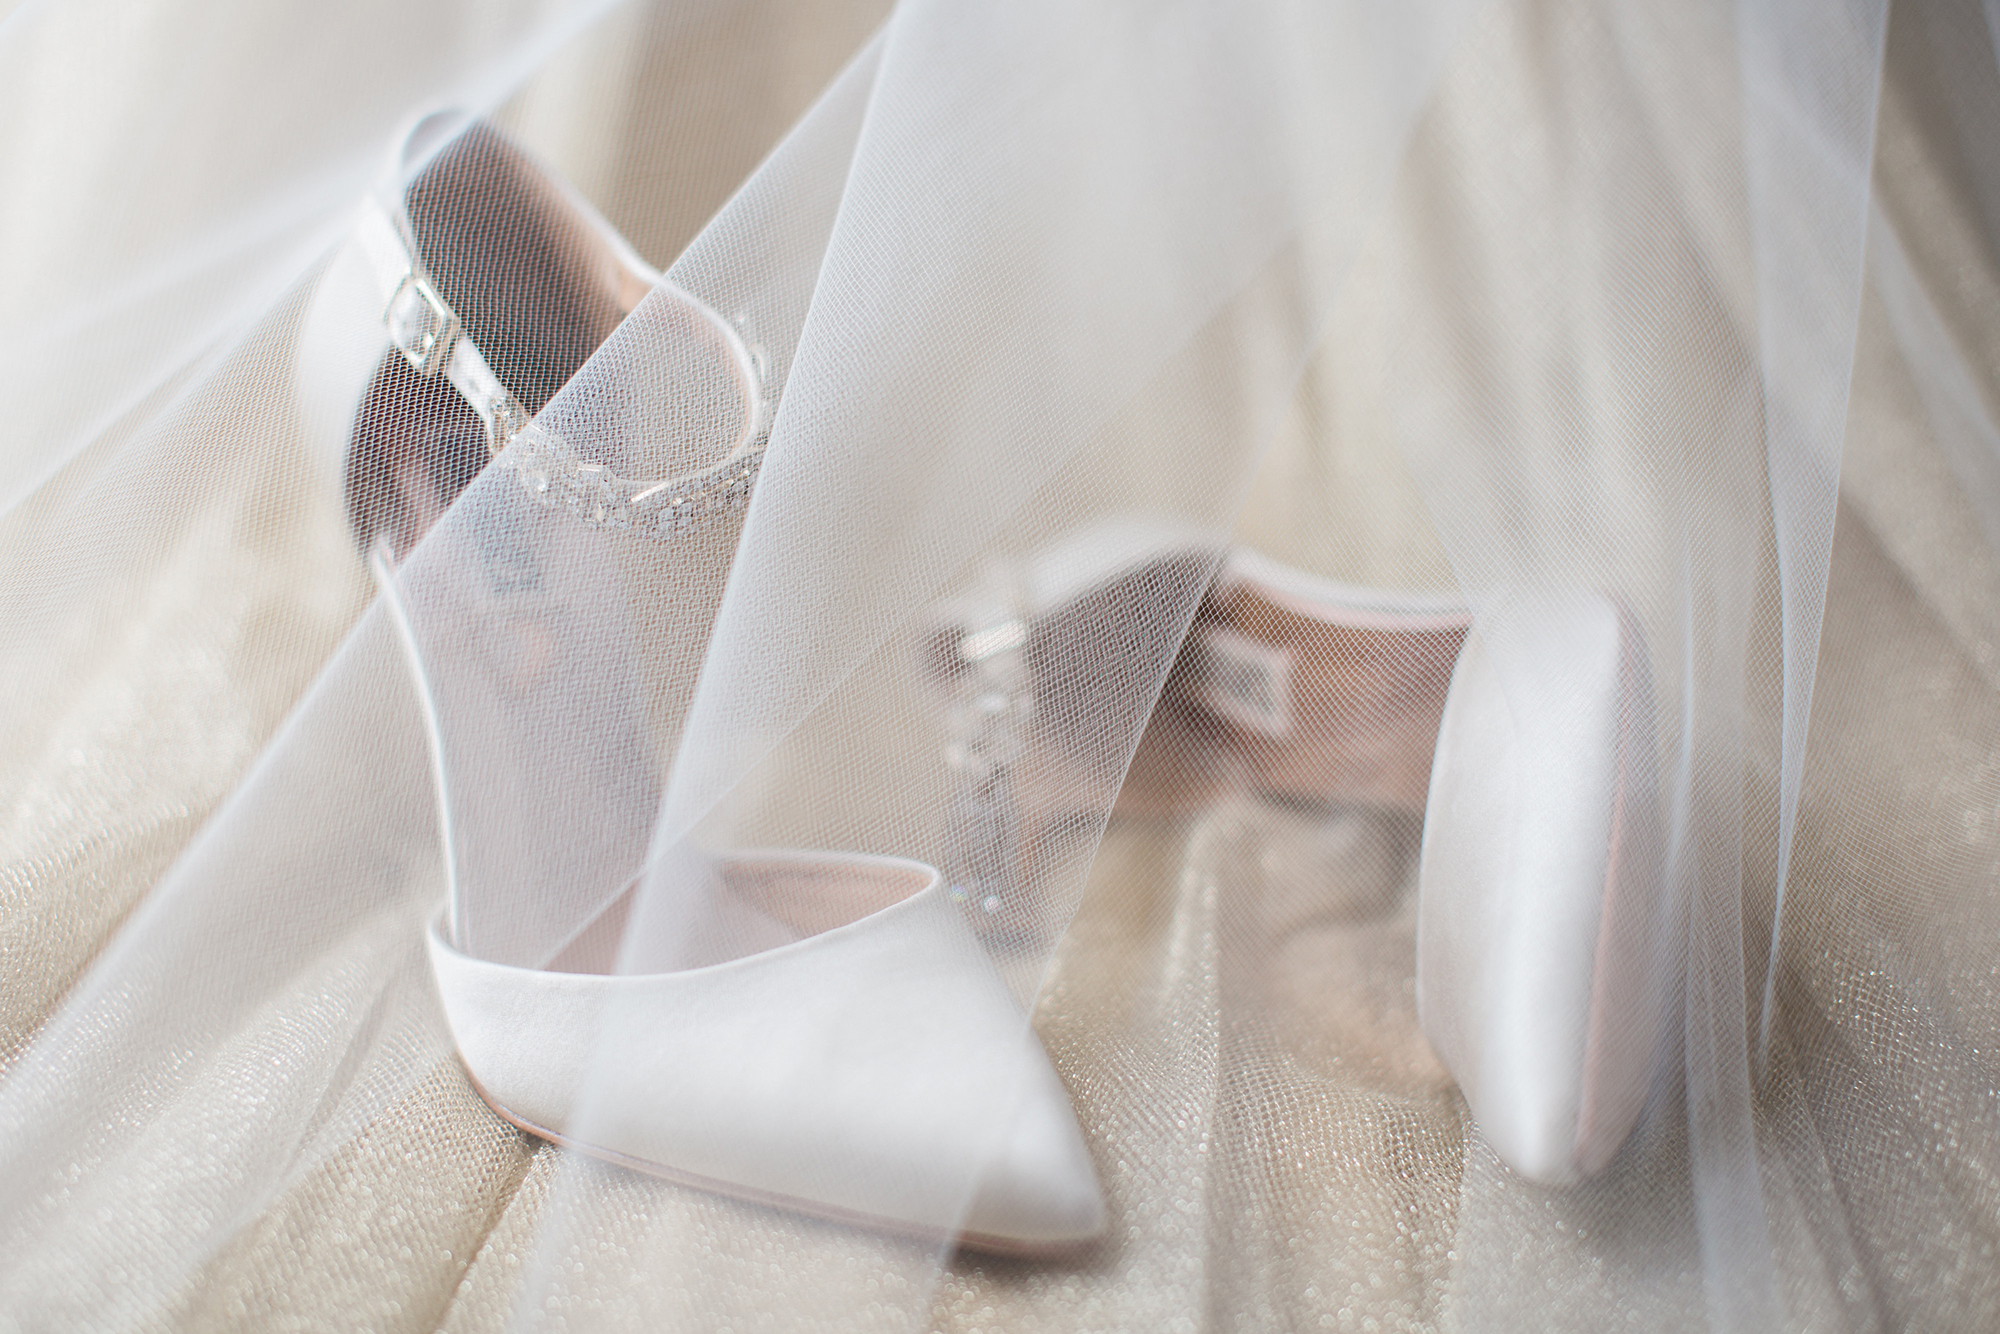 Crystal Ballroom Wedding Erin Stubblefield Weddings and Portraiture St. Louis 3.jpeg